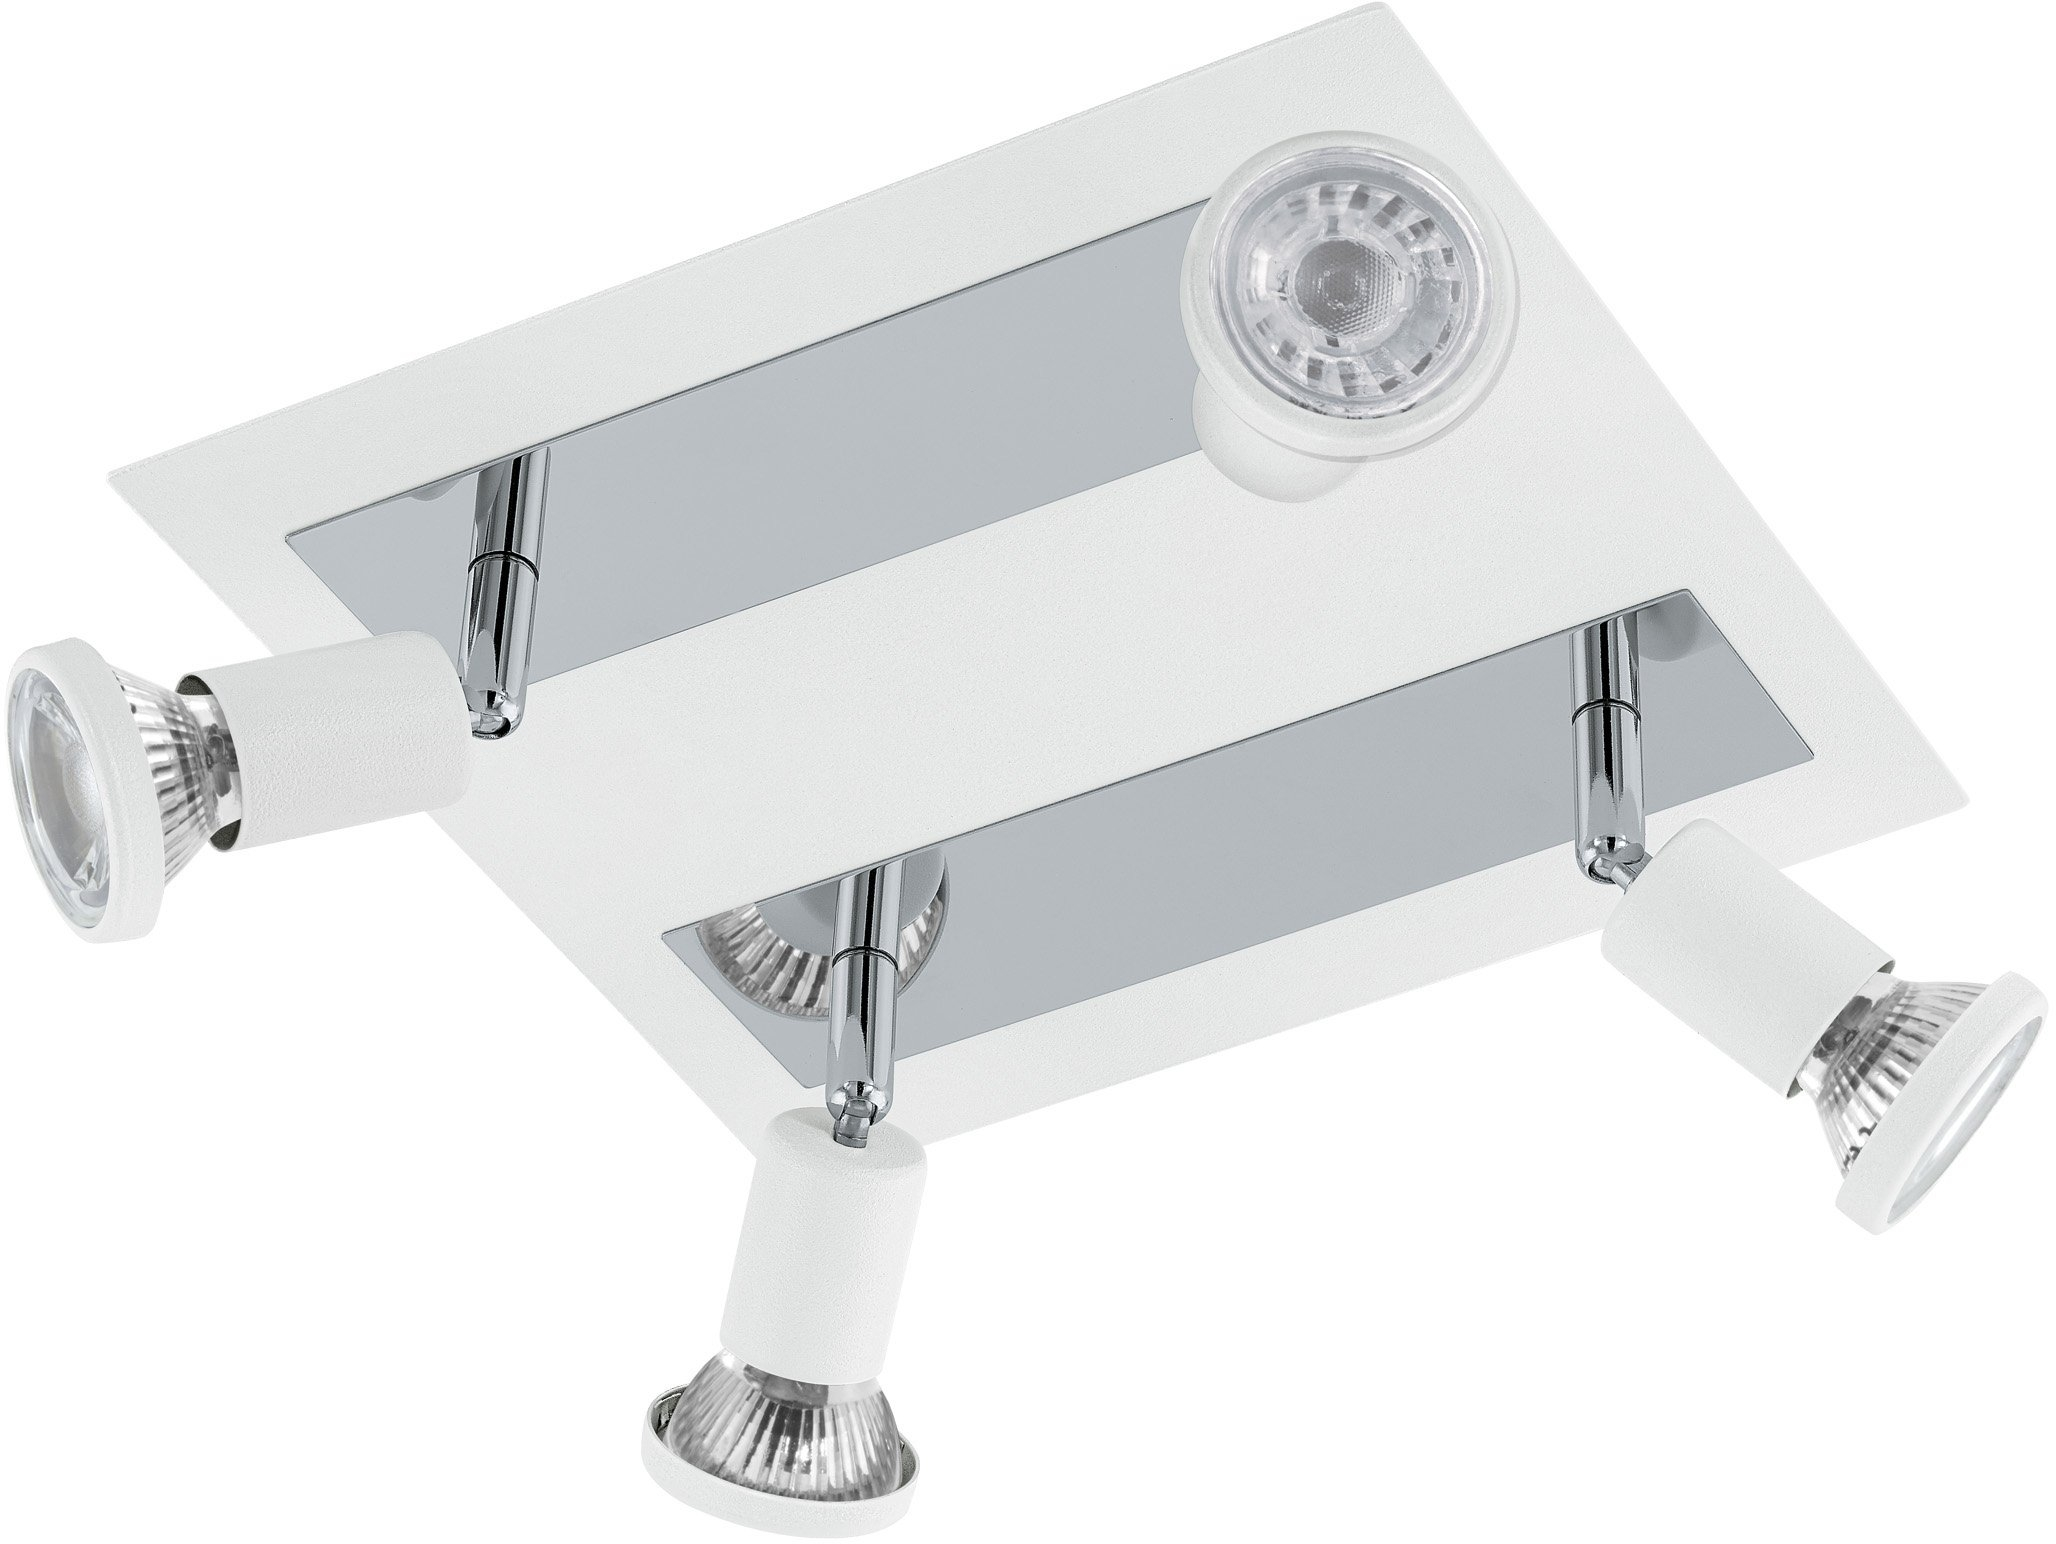 EGLO led-plafondspots SARRIA Led-plafondlamp veilig op otto.nl kopen